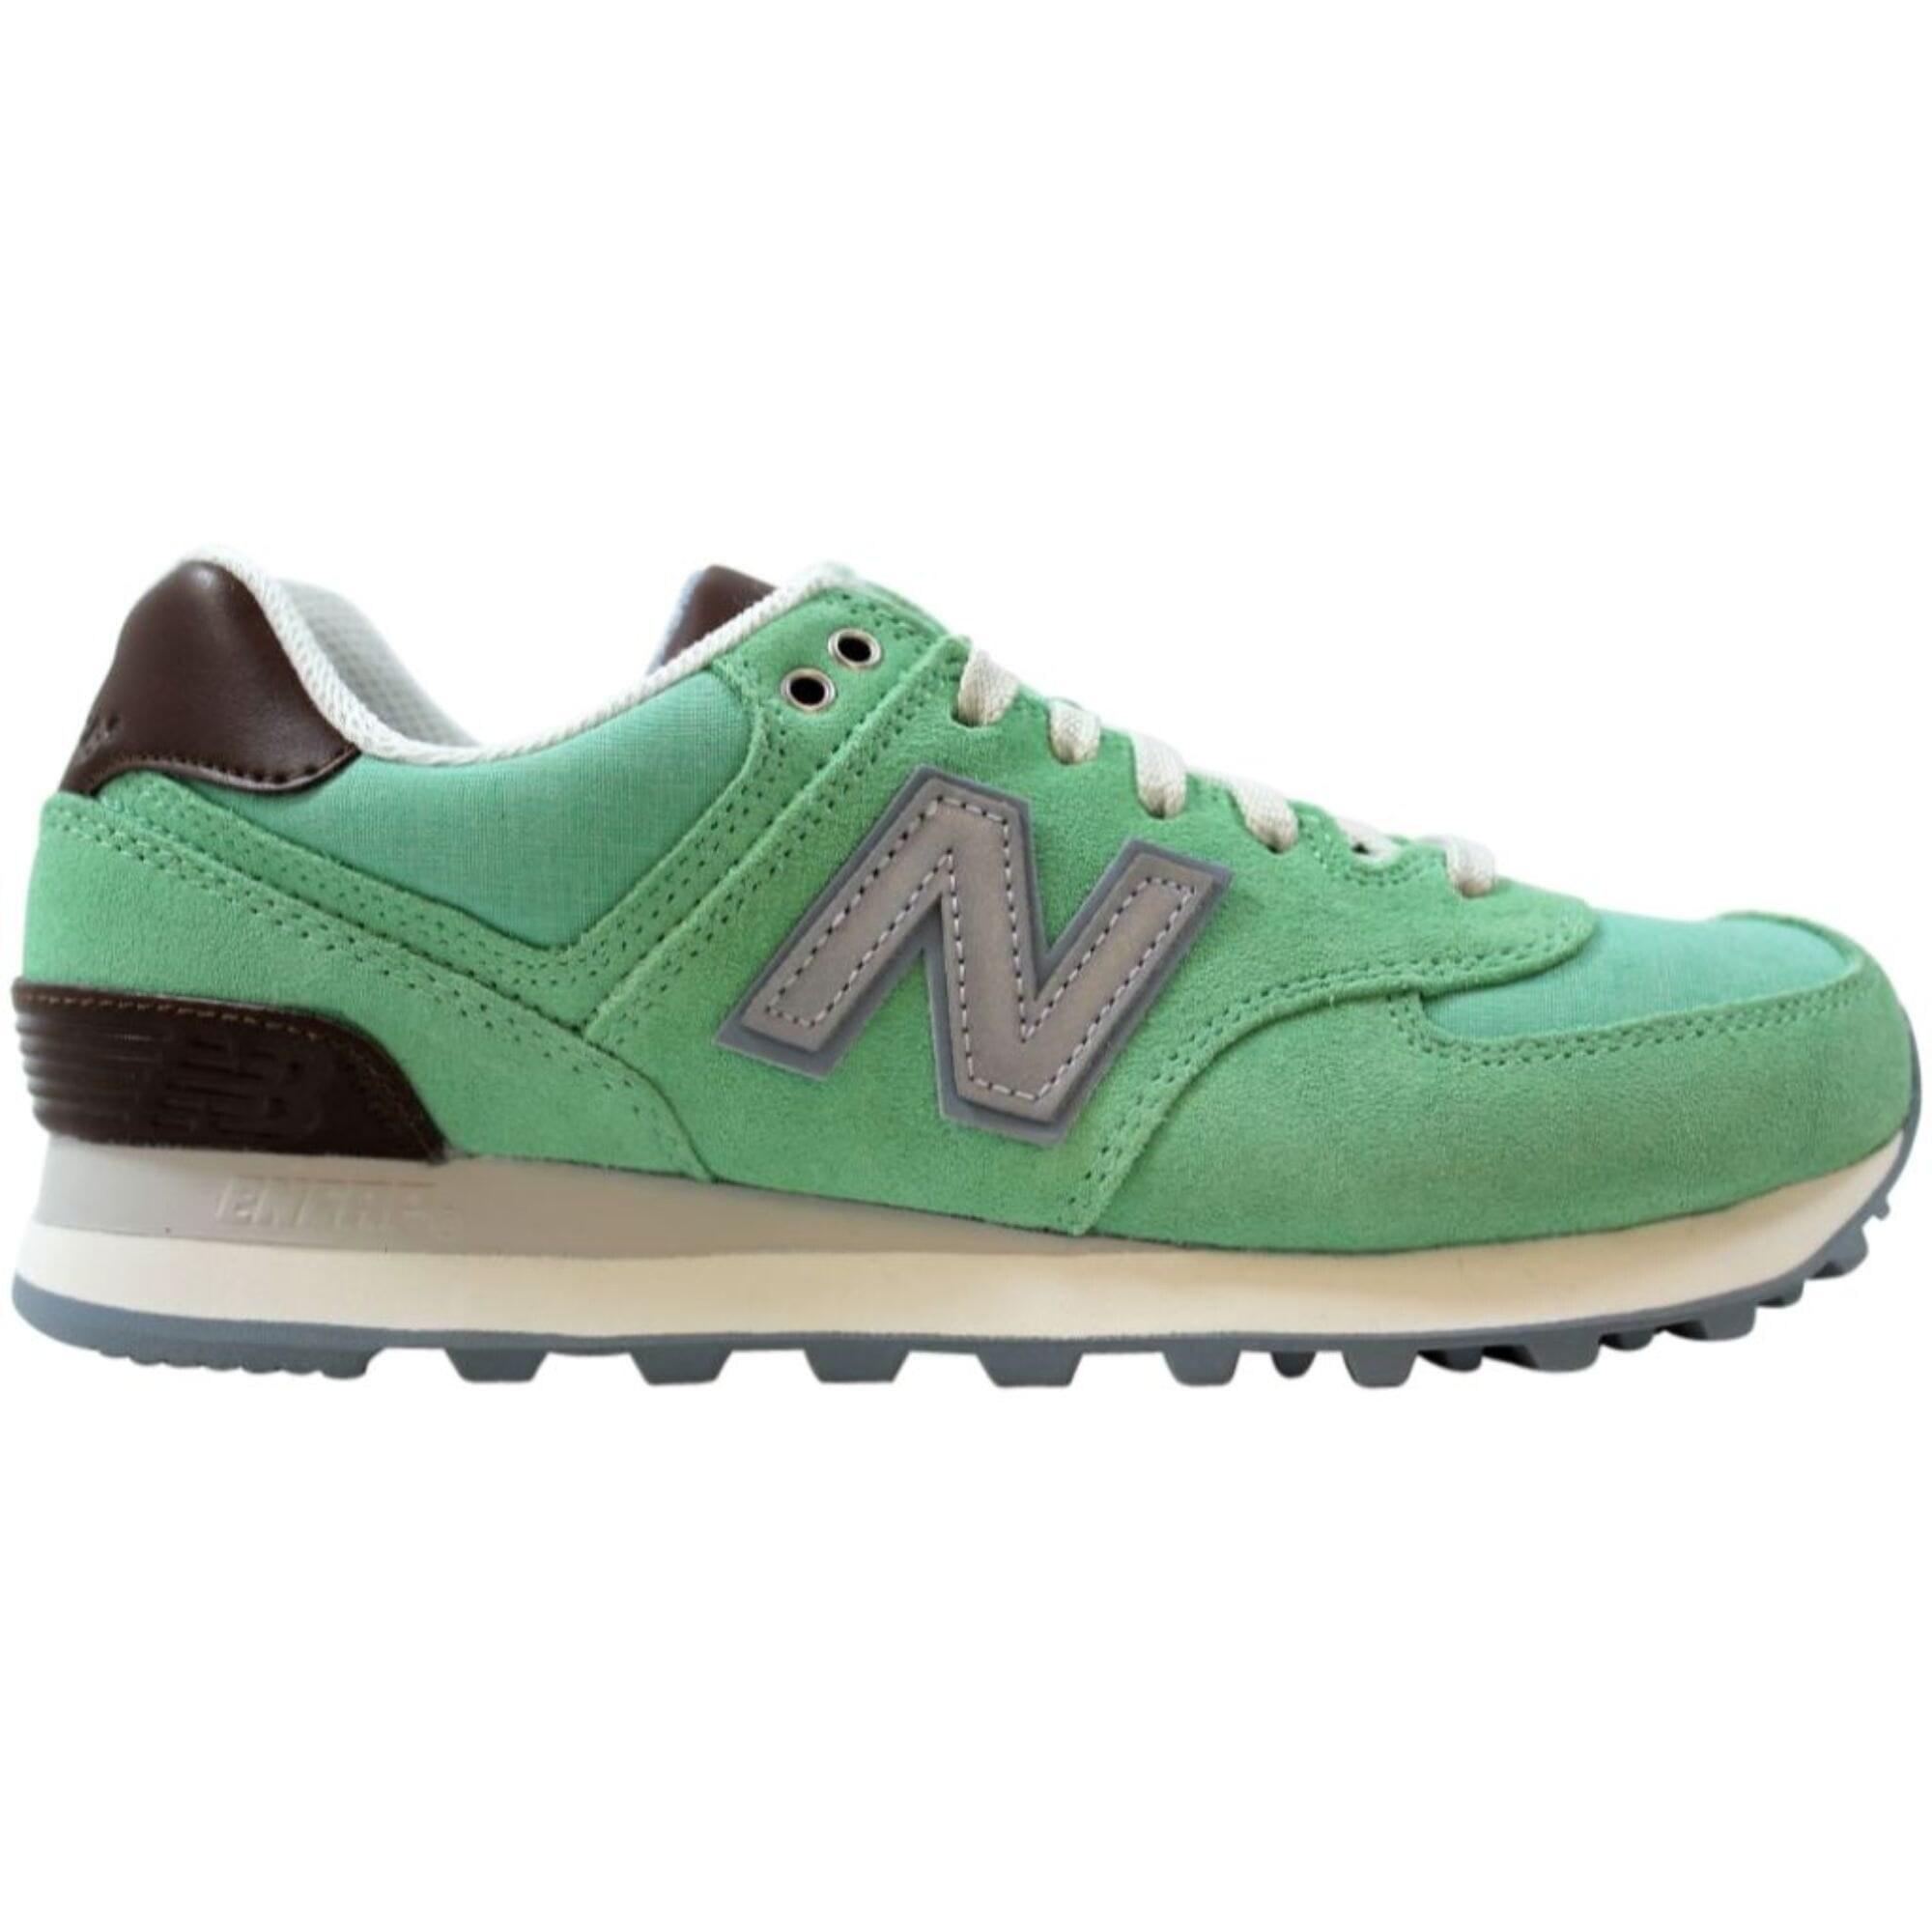 new balance 574 size 5